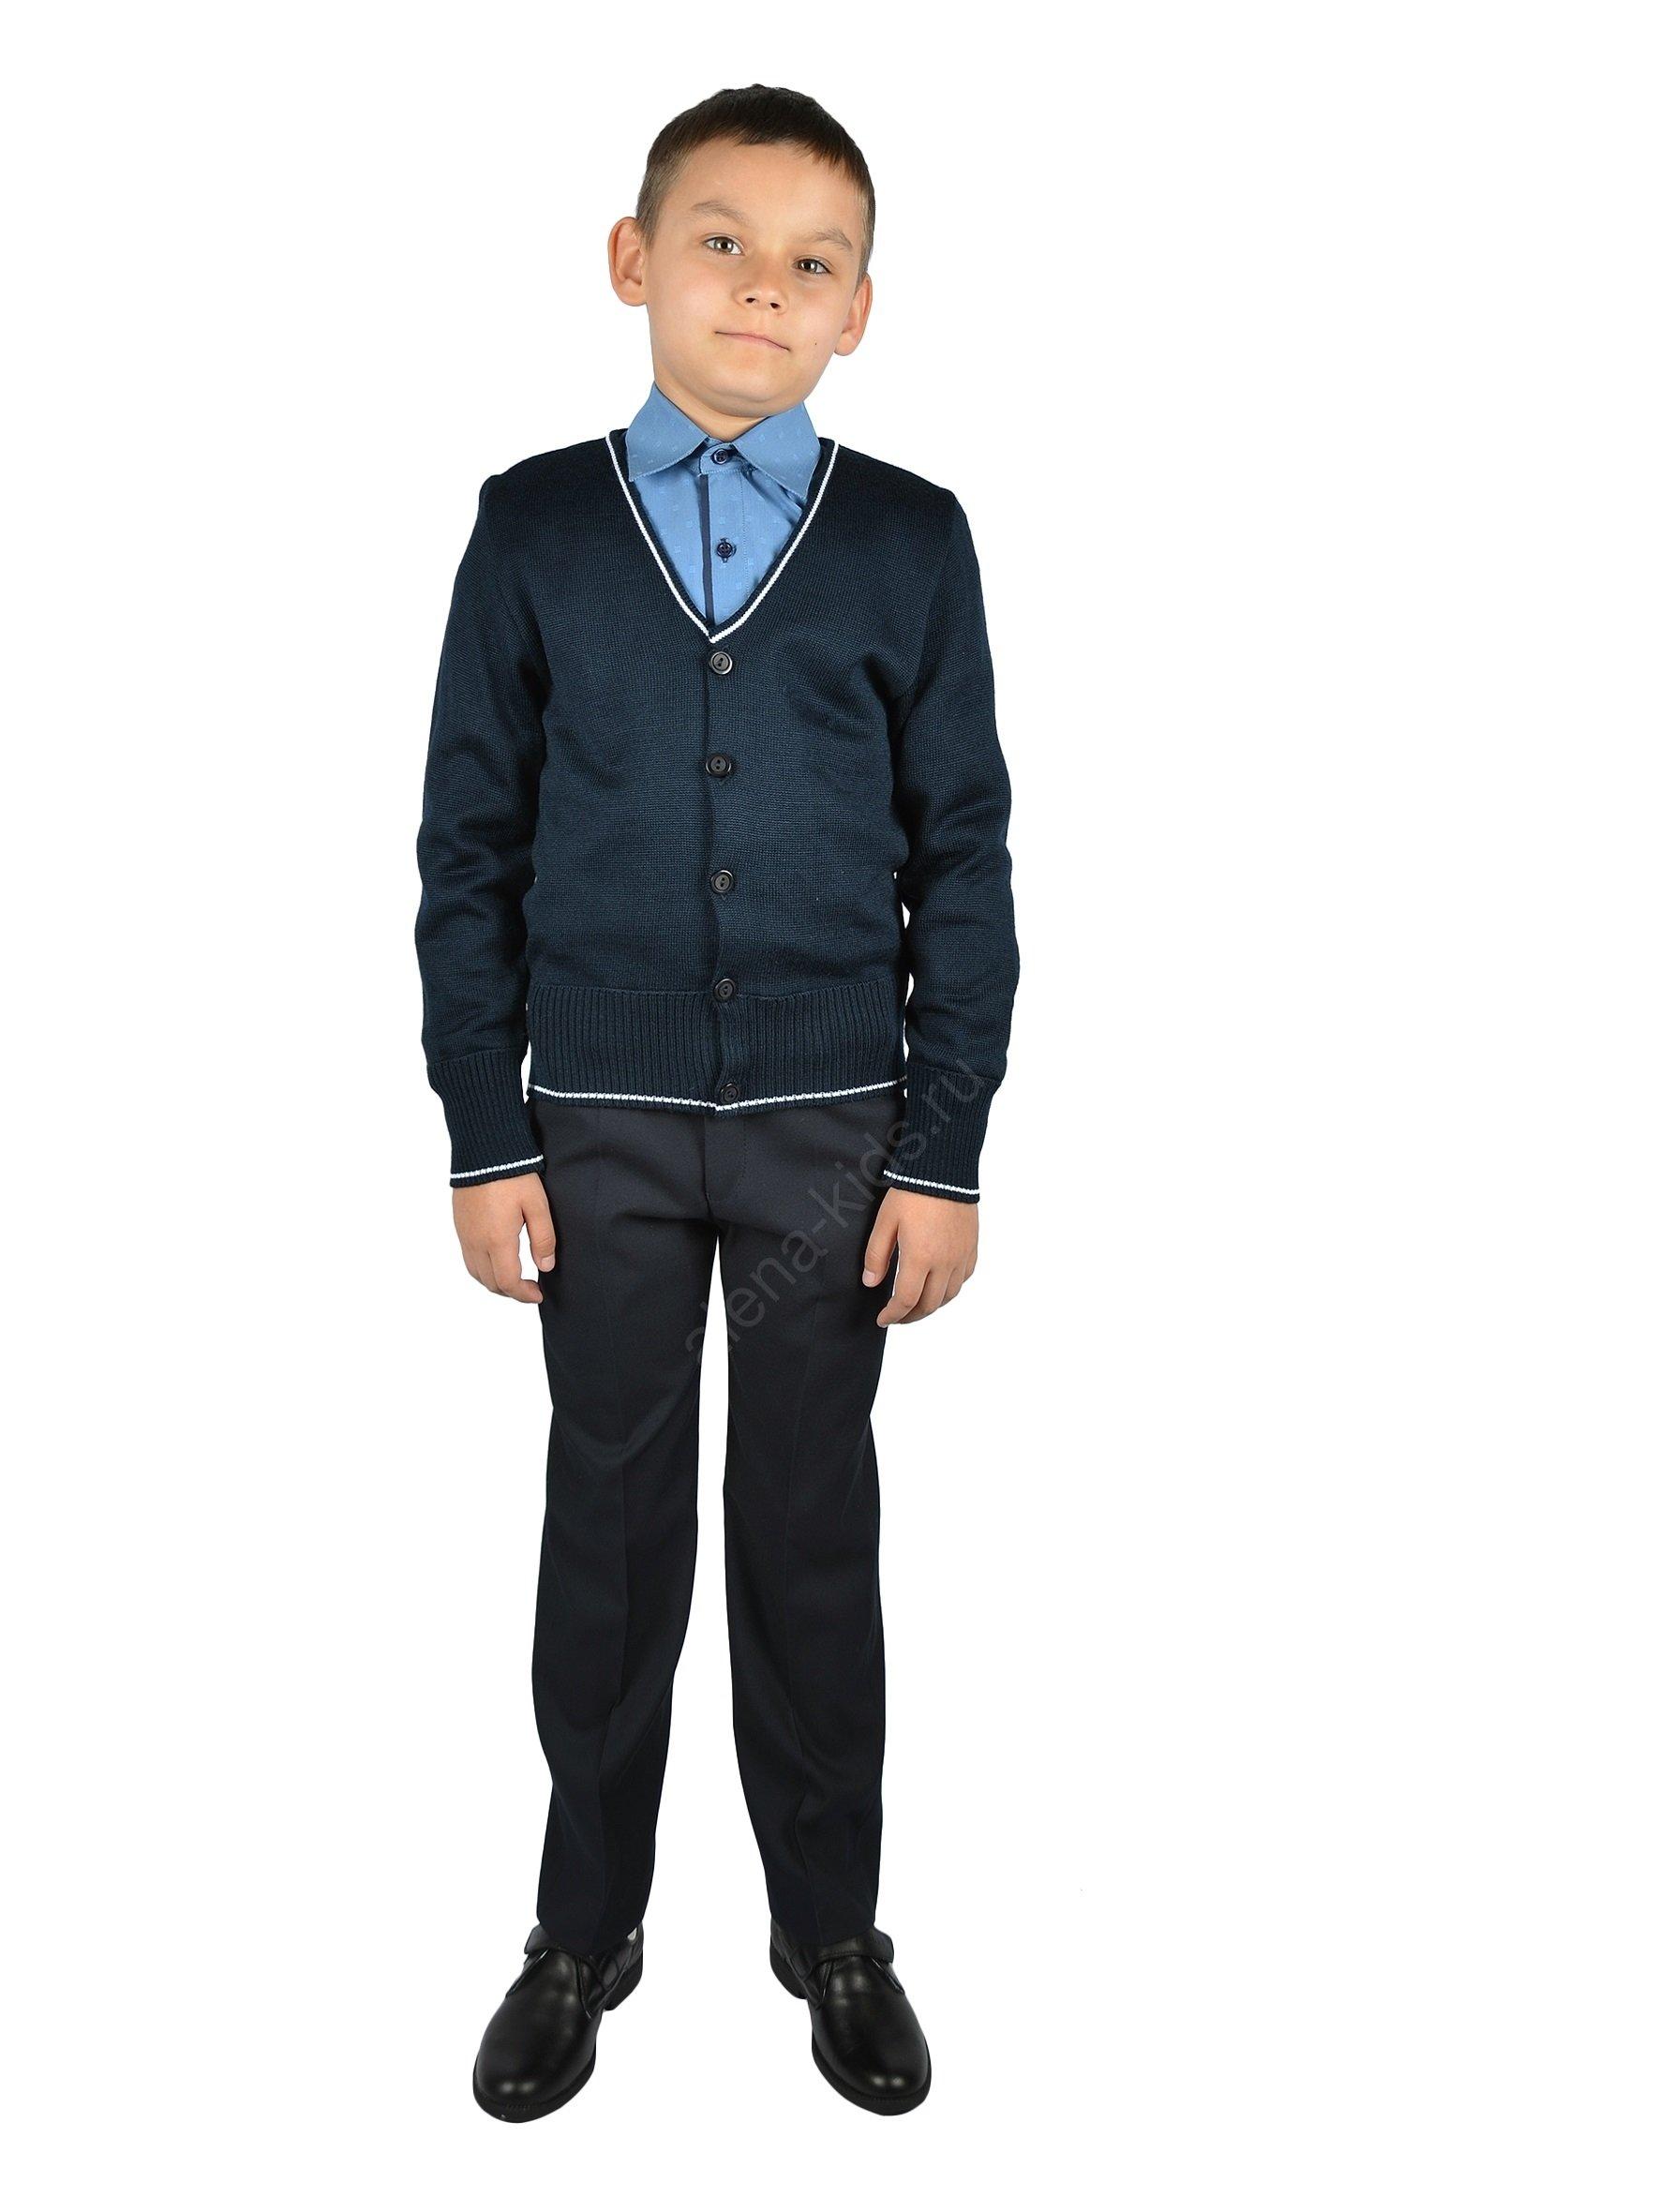 Жакет для мальчика YSTT-ЖКД-3т-син